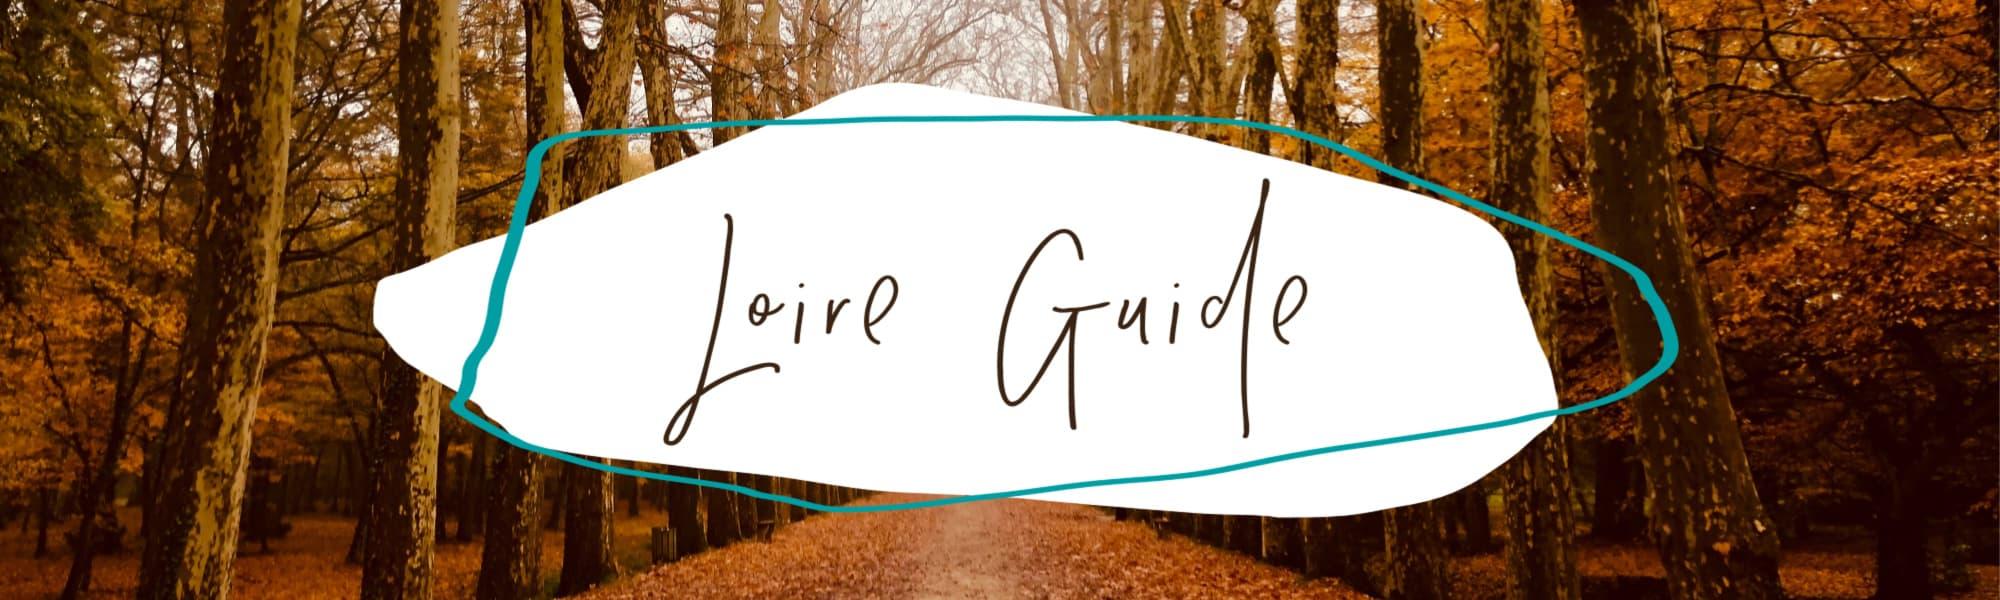 Loire travel guide